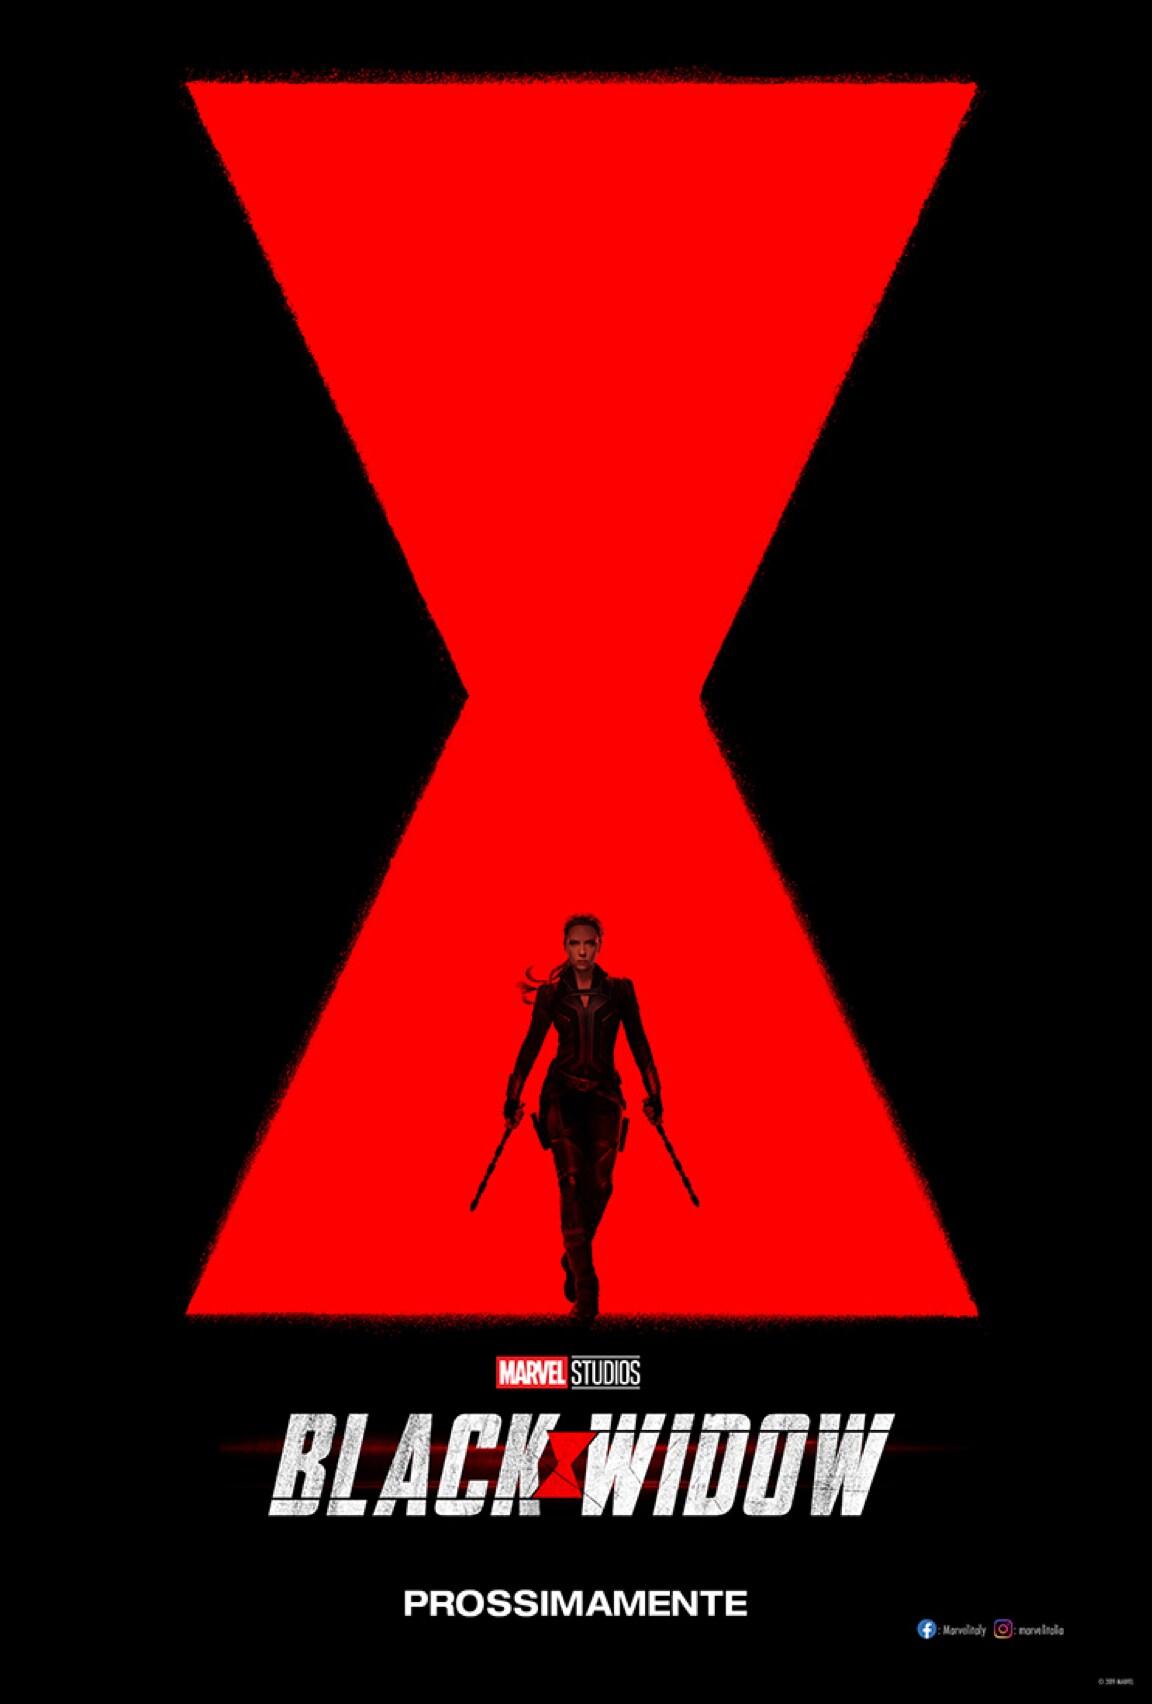 Personaggi dal film Black Widow